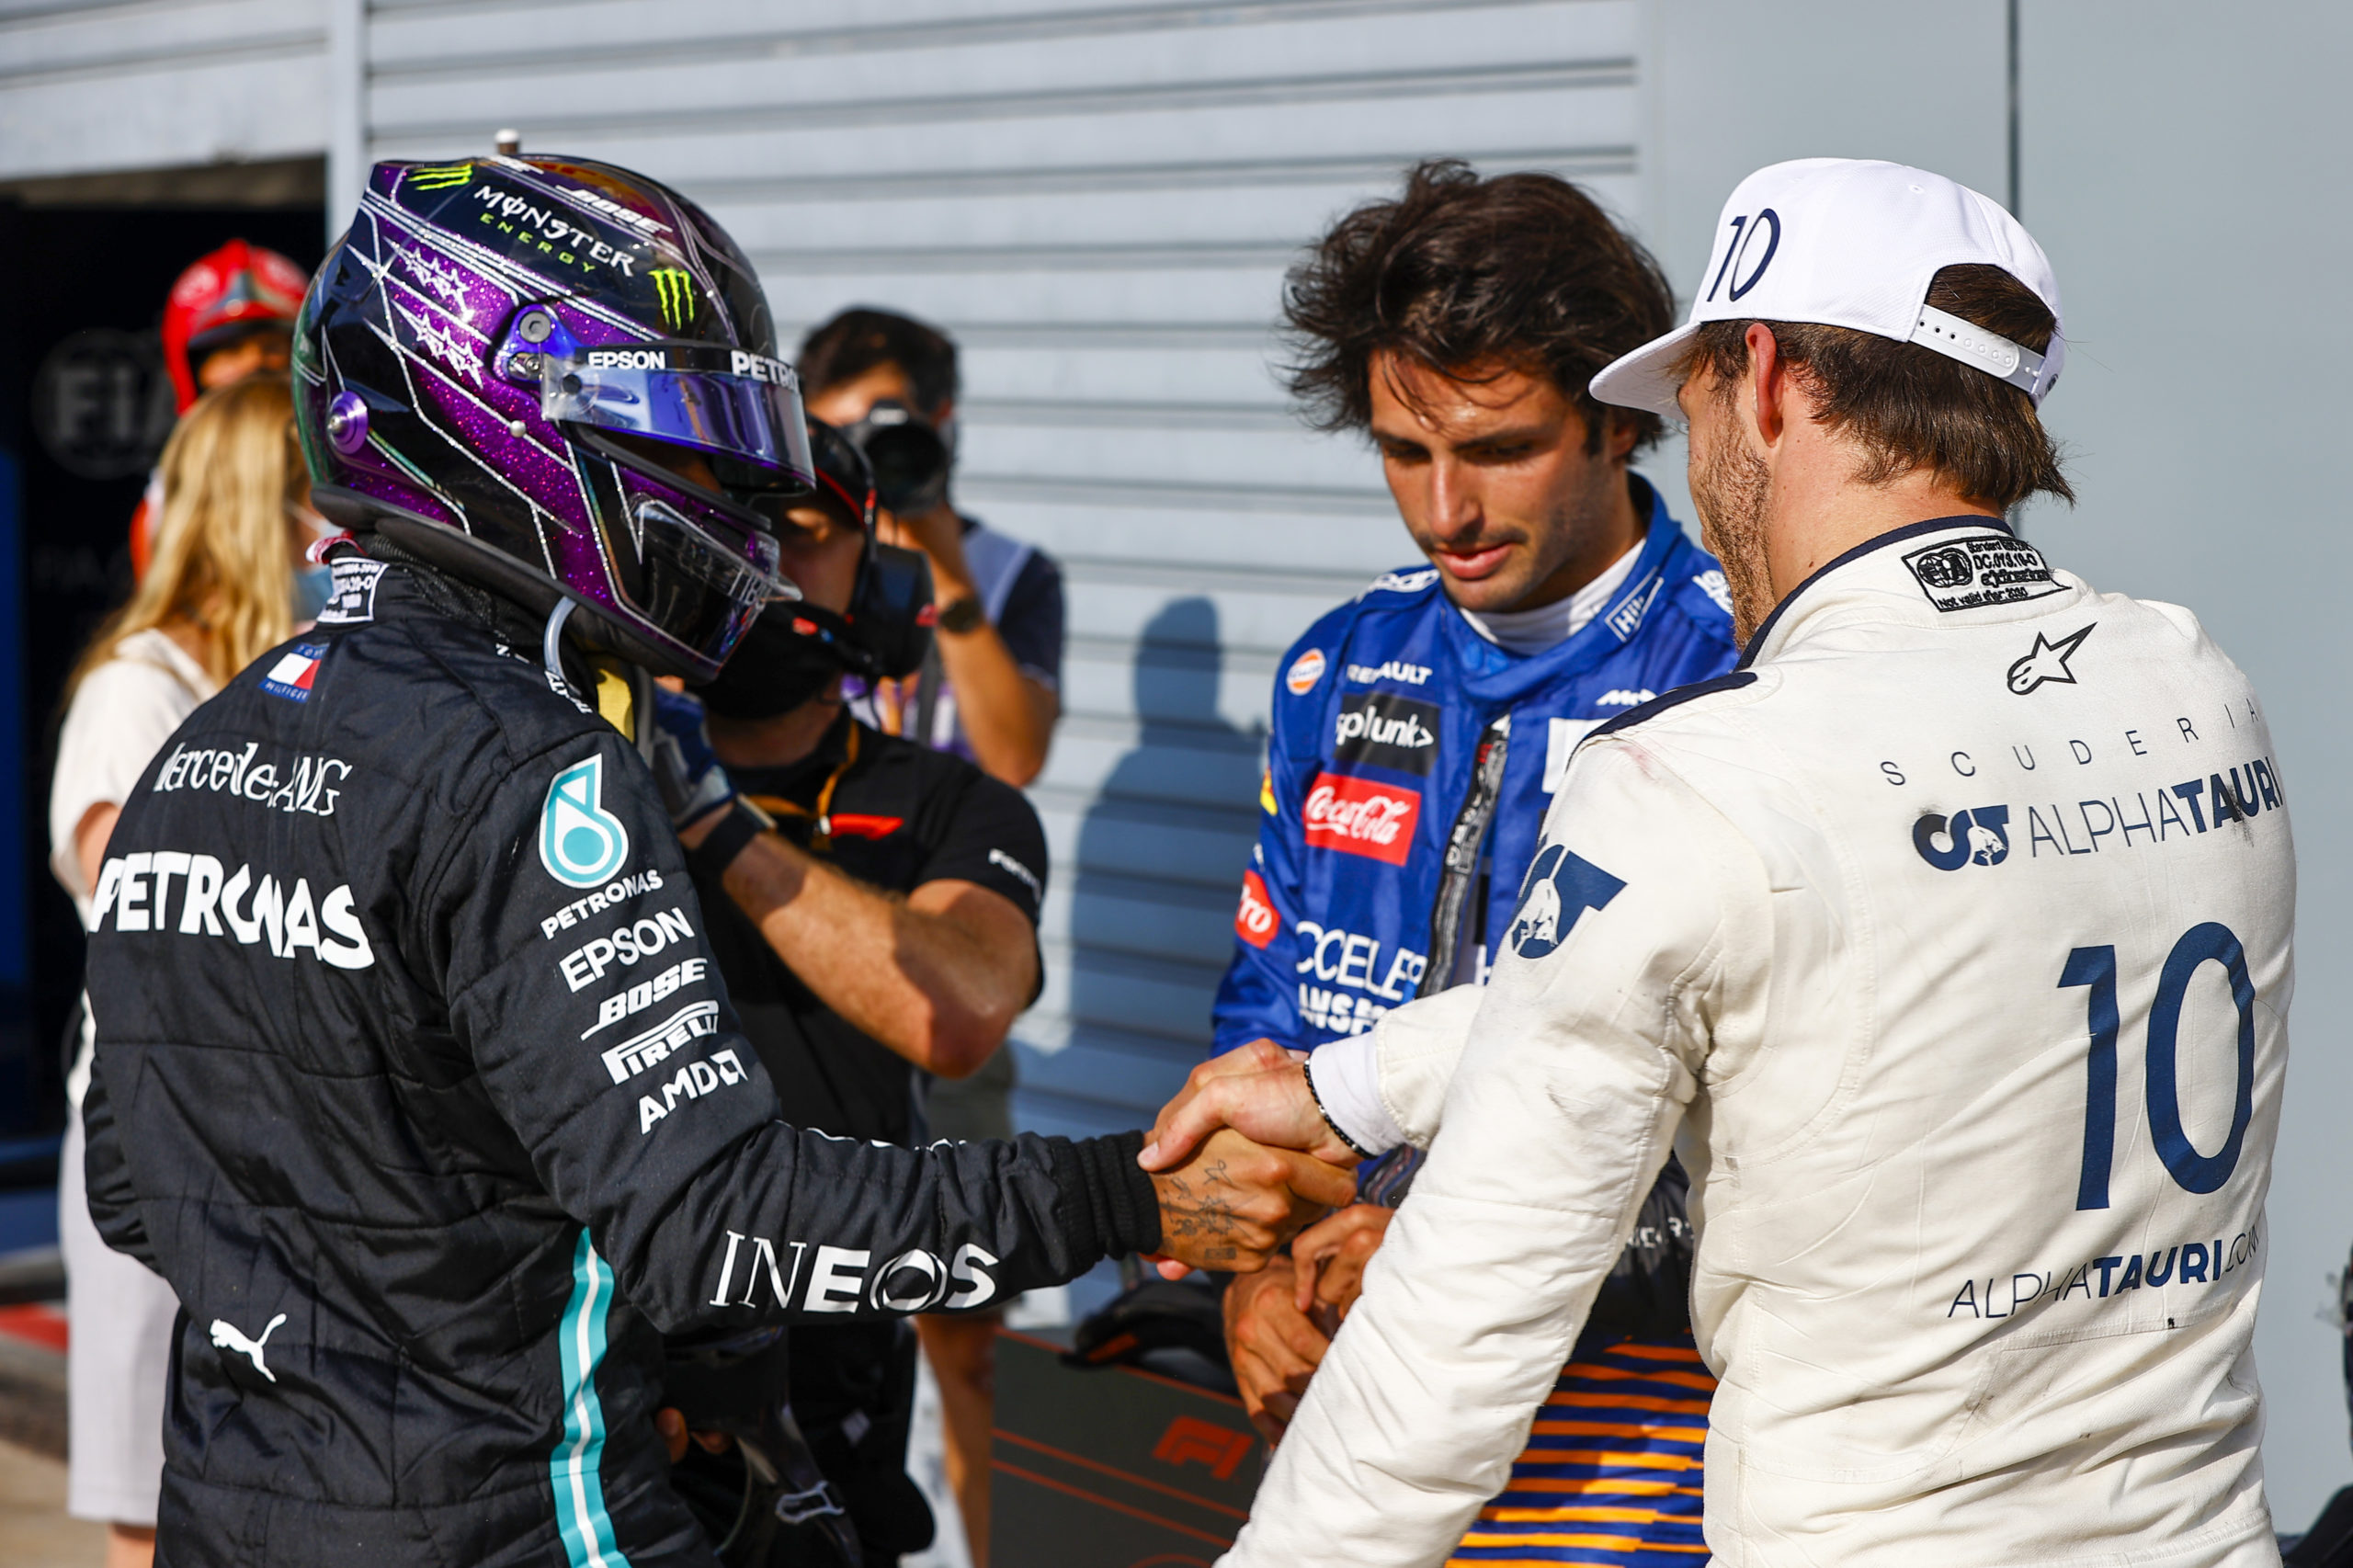 2020 Italian Grand Prix, Sunday - LAT Images, Mercedes, Hamilton, Gasly, Sainz